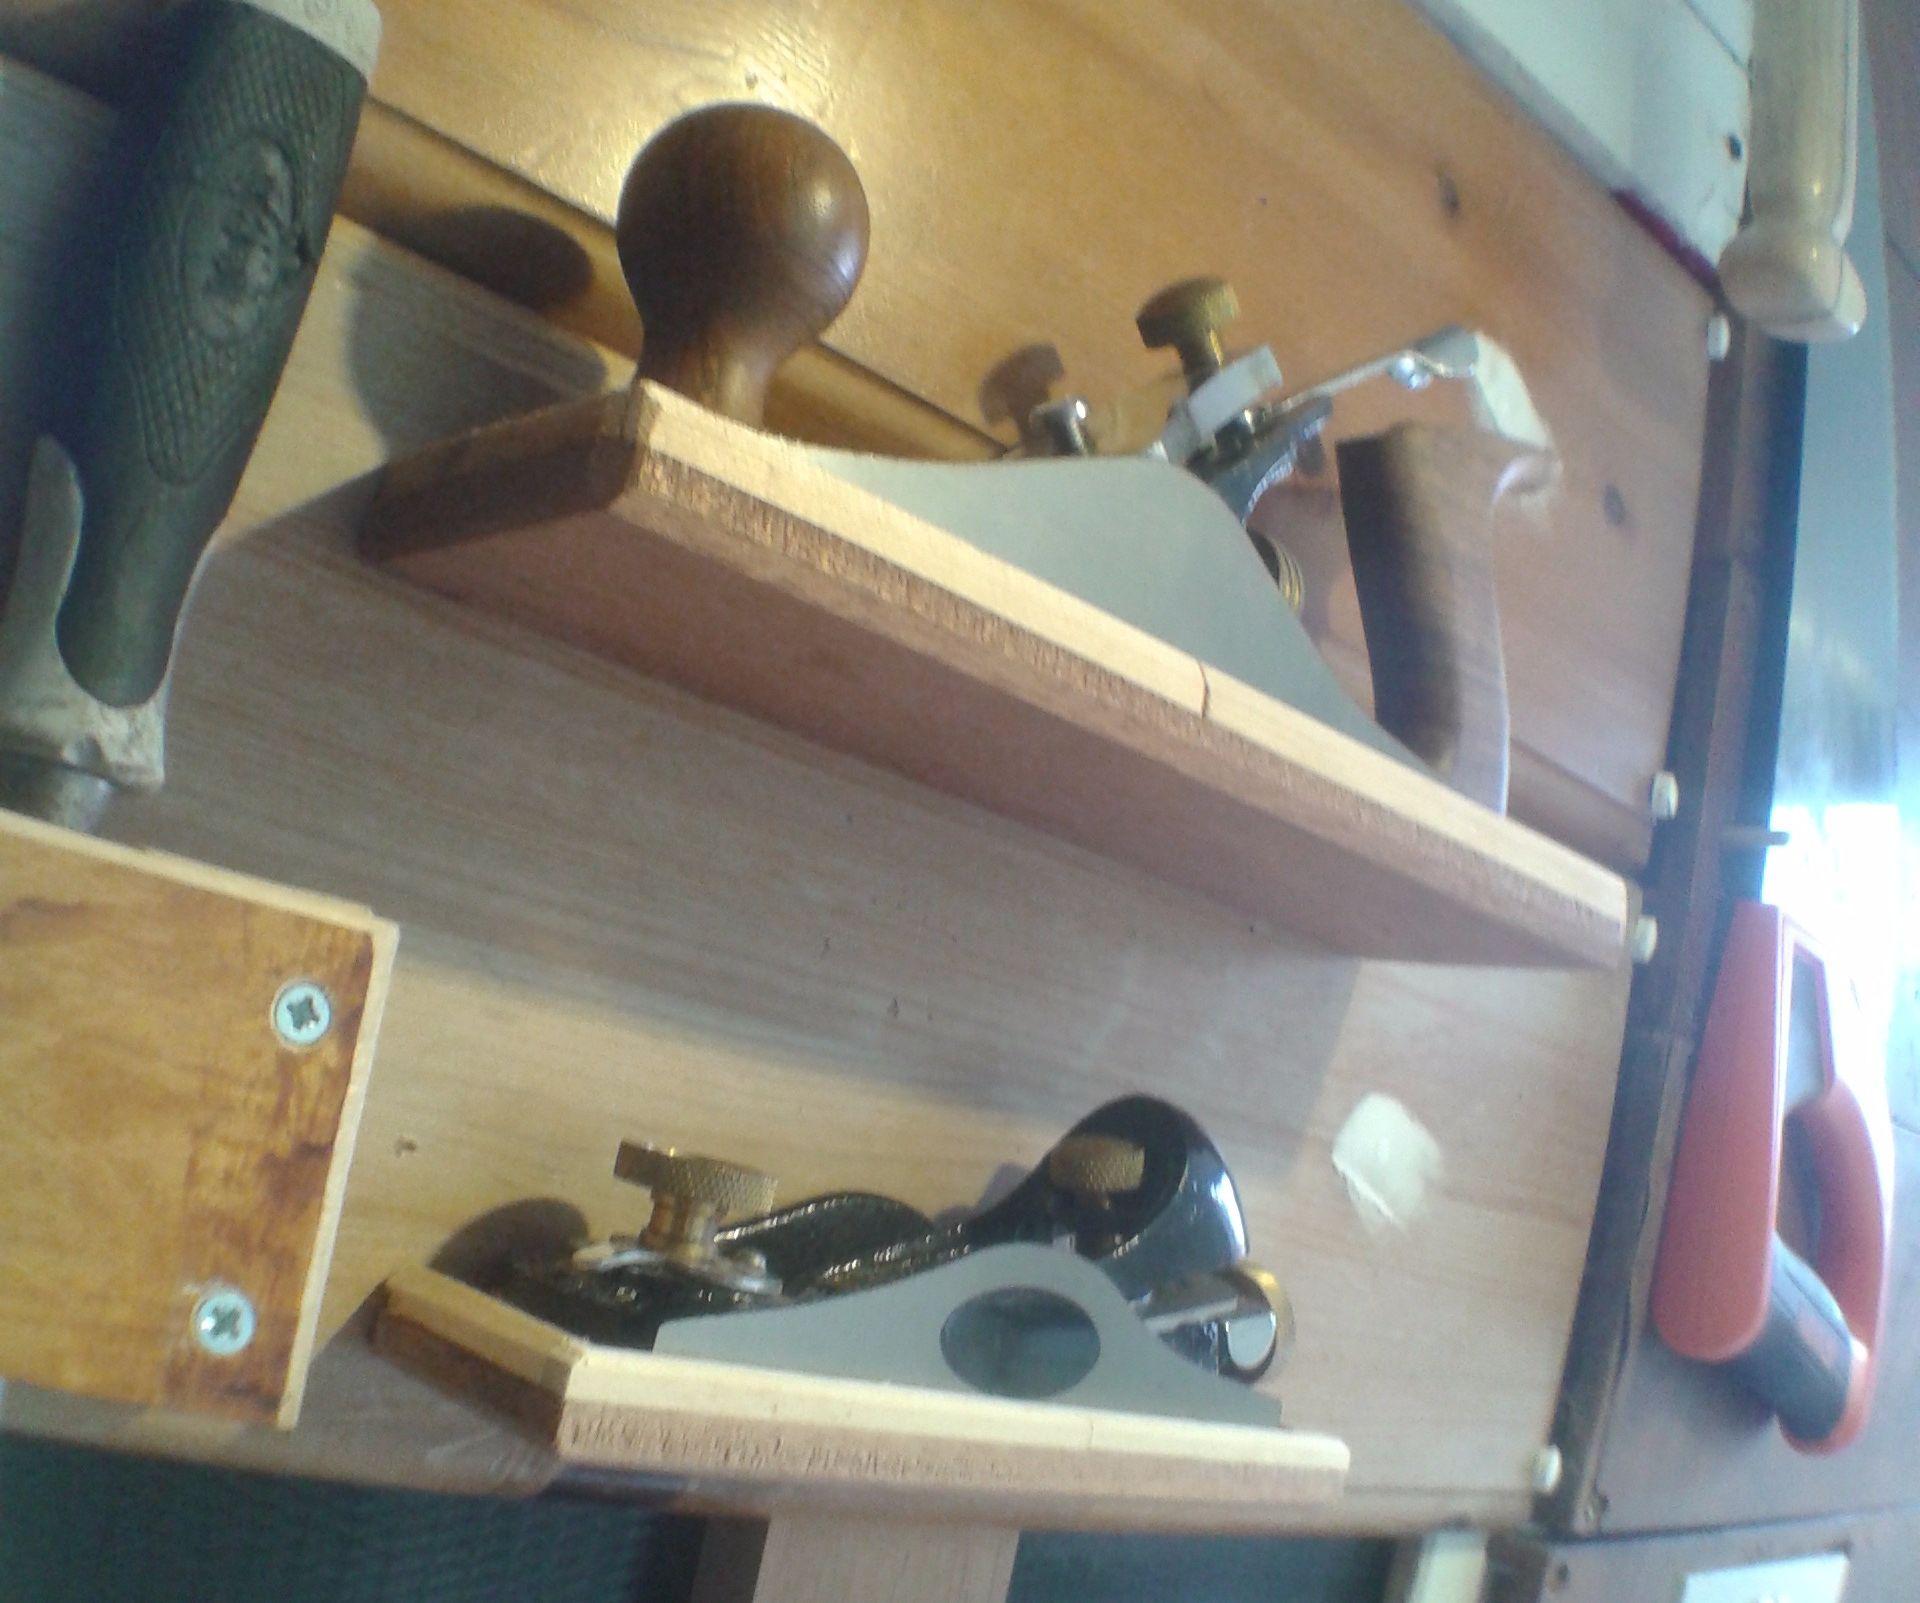 Plane Holder / Floating Shelf